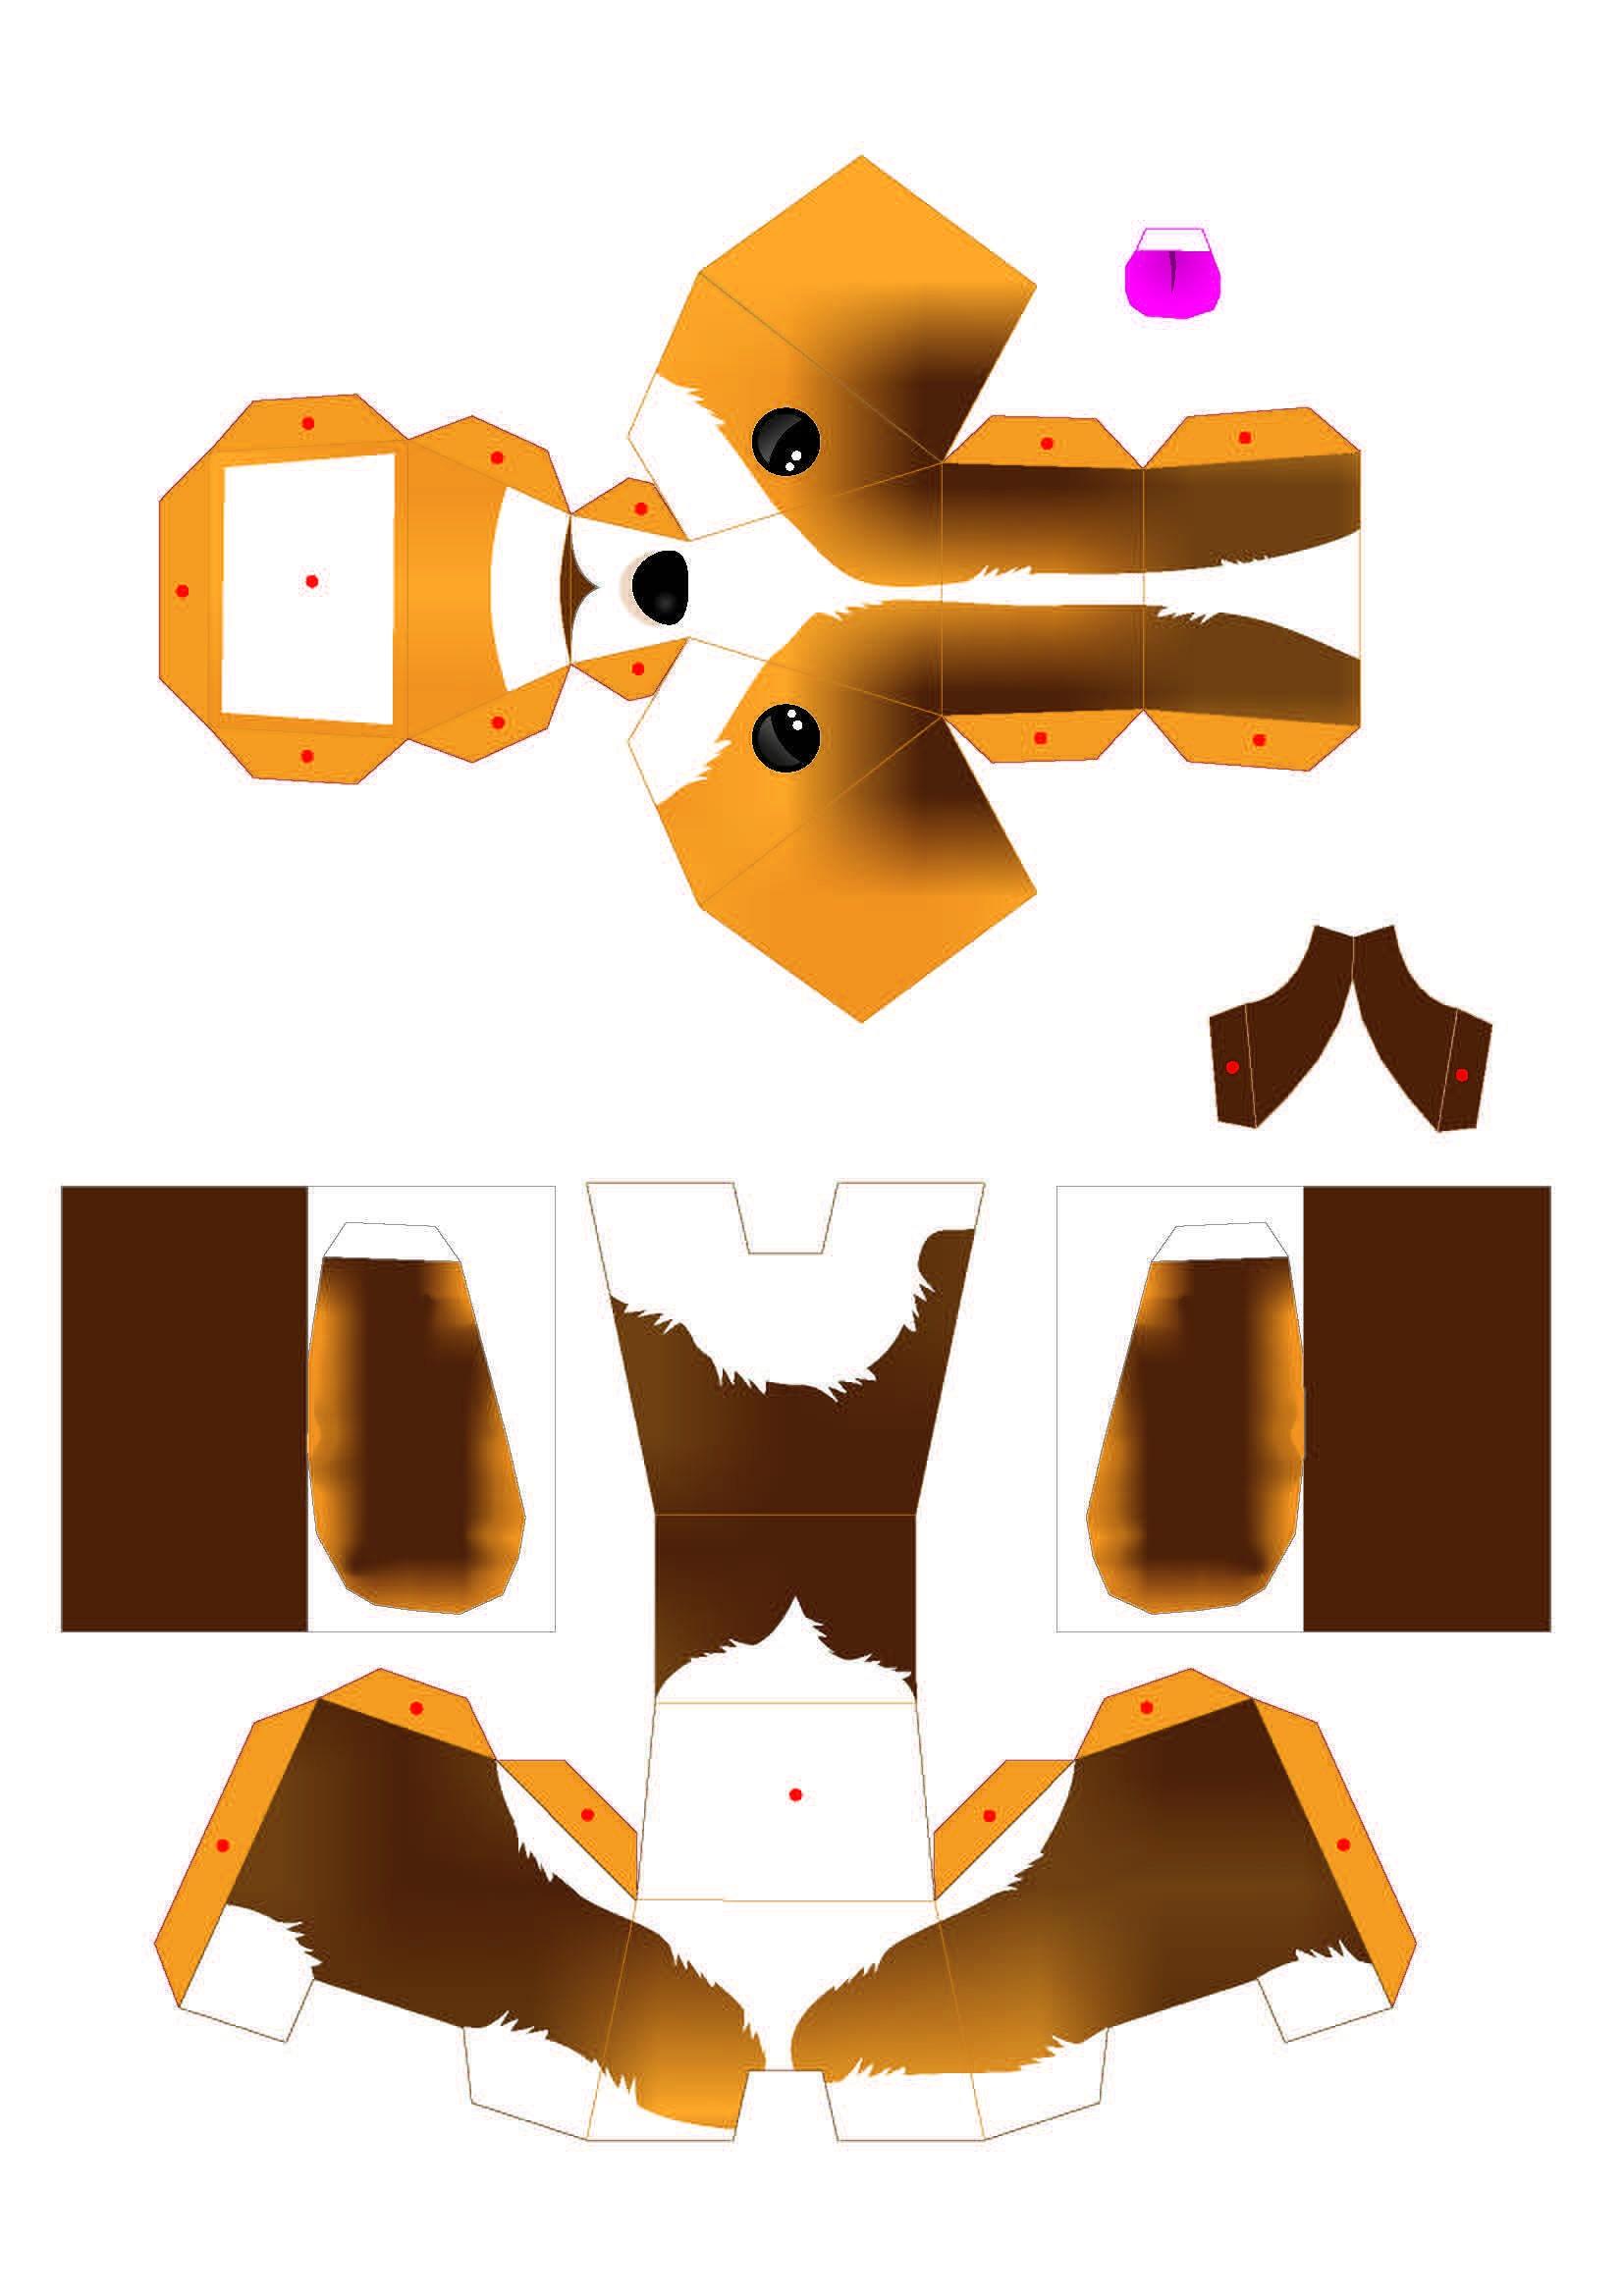 Domo Papercraft Perritos 3d Para Imprimir Y Armar Gratis